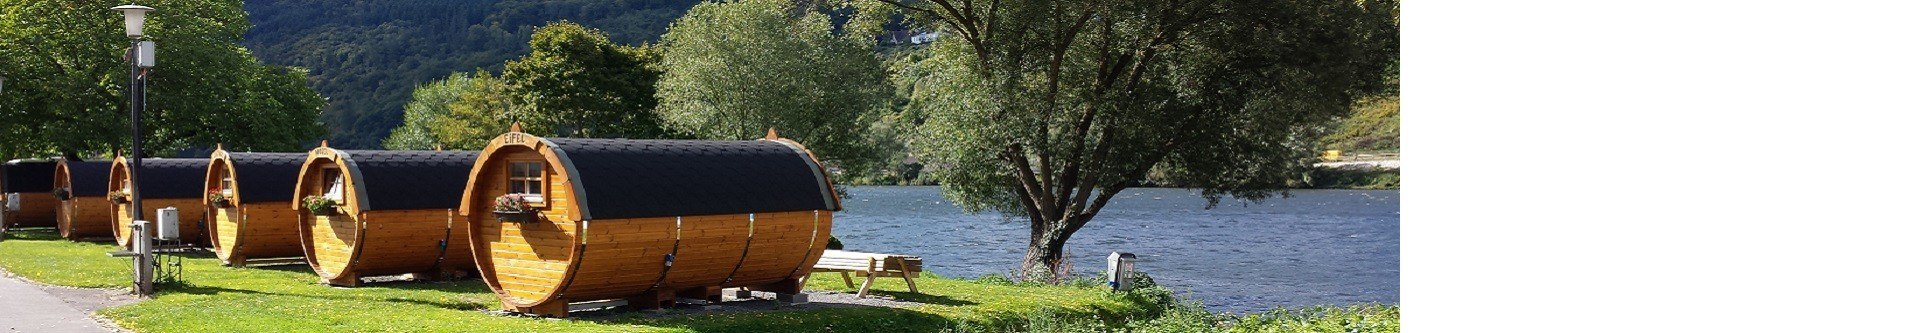 Camping Barrils - Caseta Barril